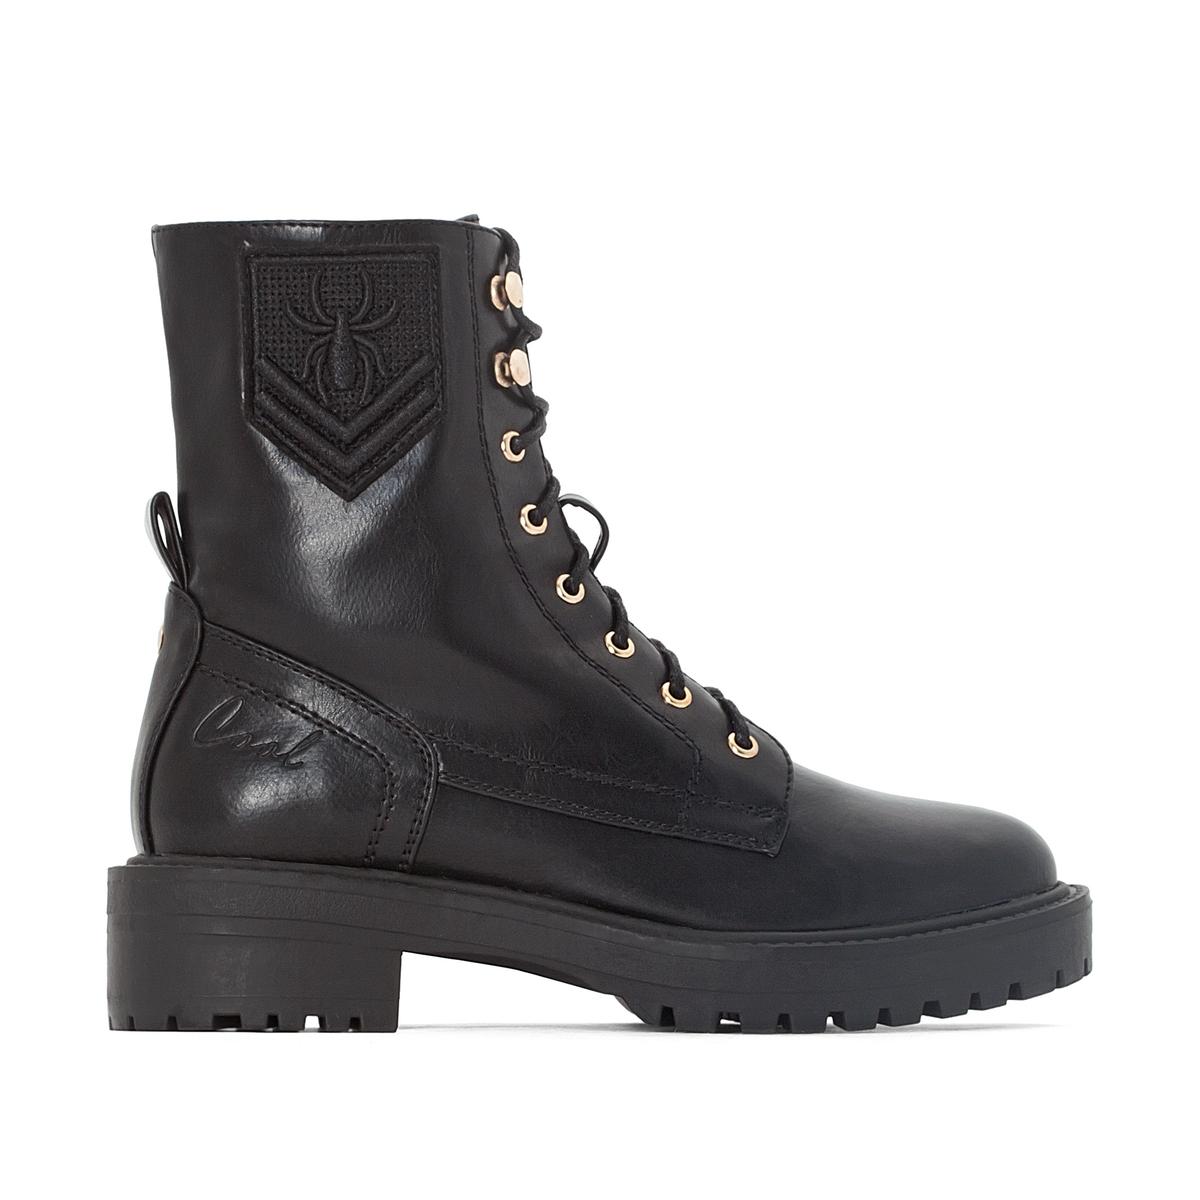 Ботинки на шнуровке Harlen